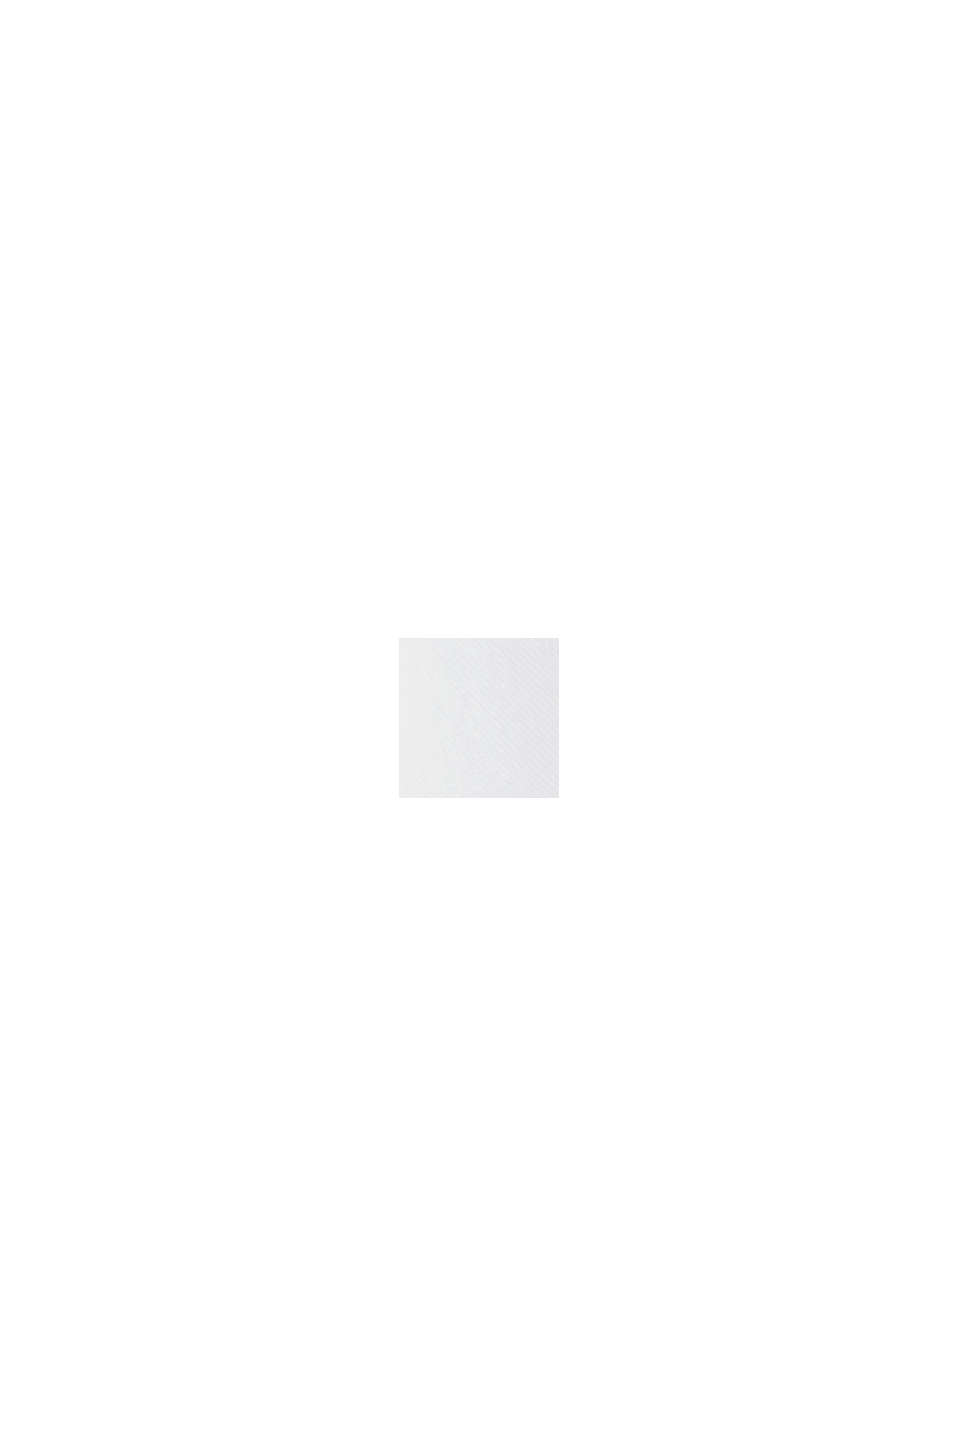 CURVY lange overhemdblouse met kraag met ruche, WHITE, swatch